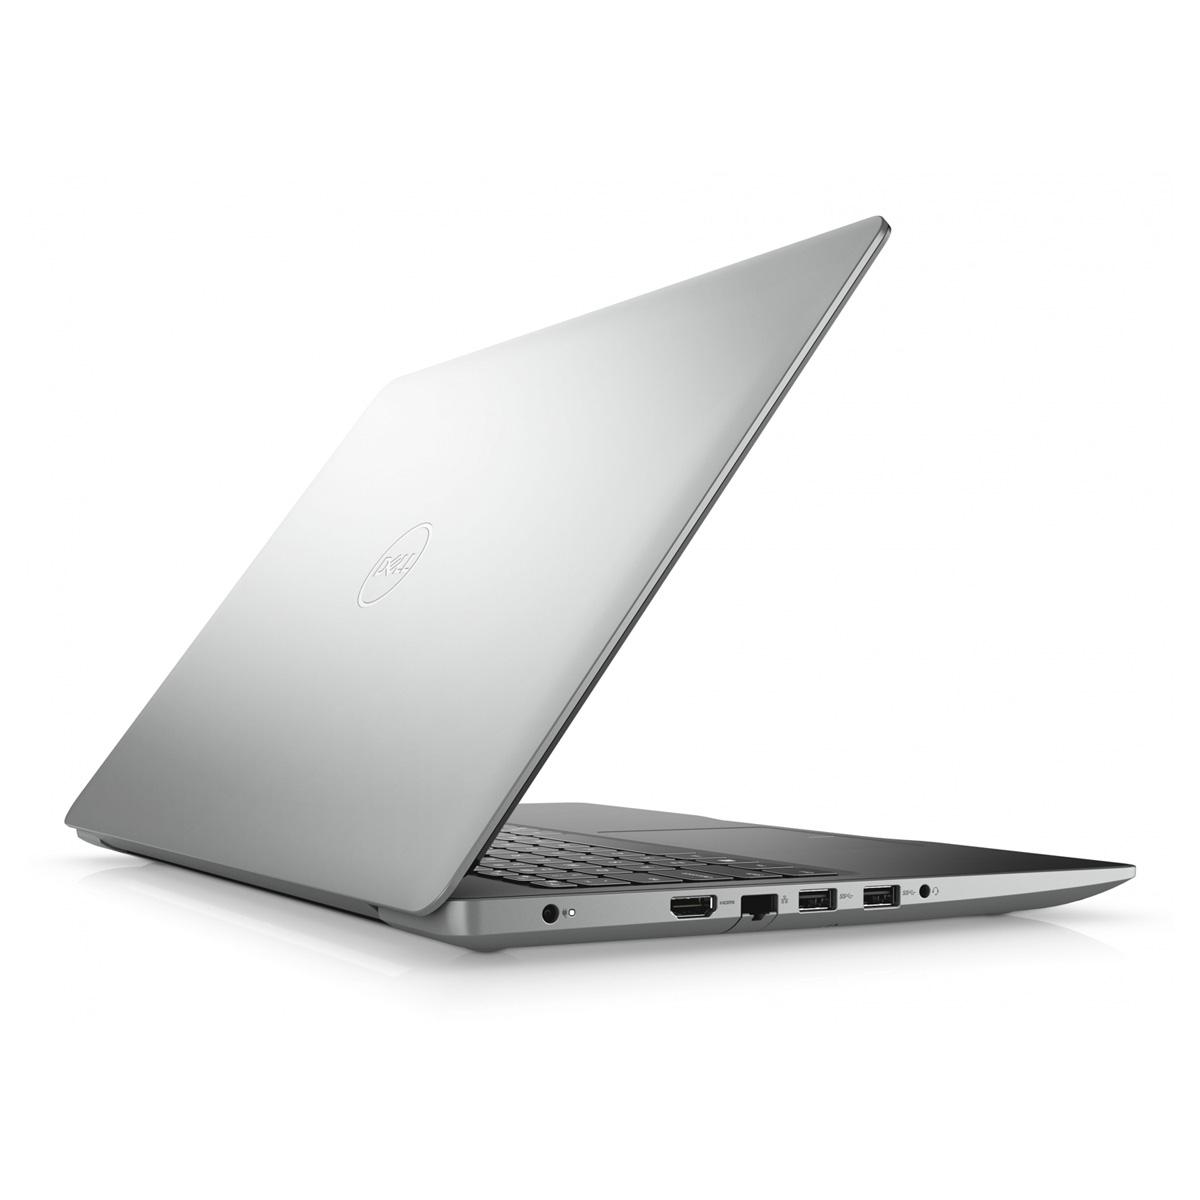 Buy Dell Inspiron 3580 8th Gen i7 Ubuntu, 4 6GHz, 8GB RAM